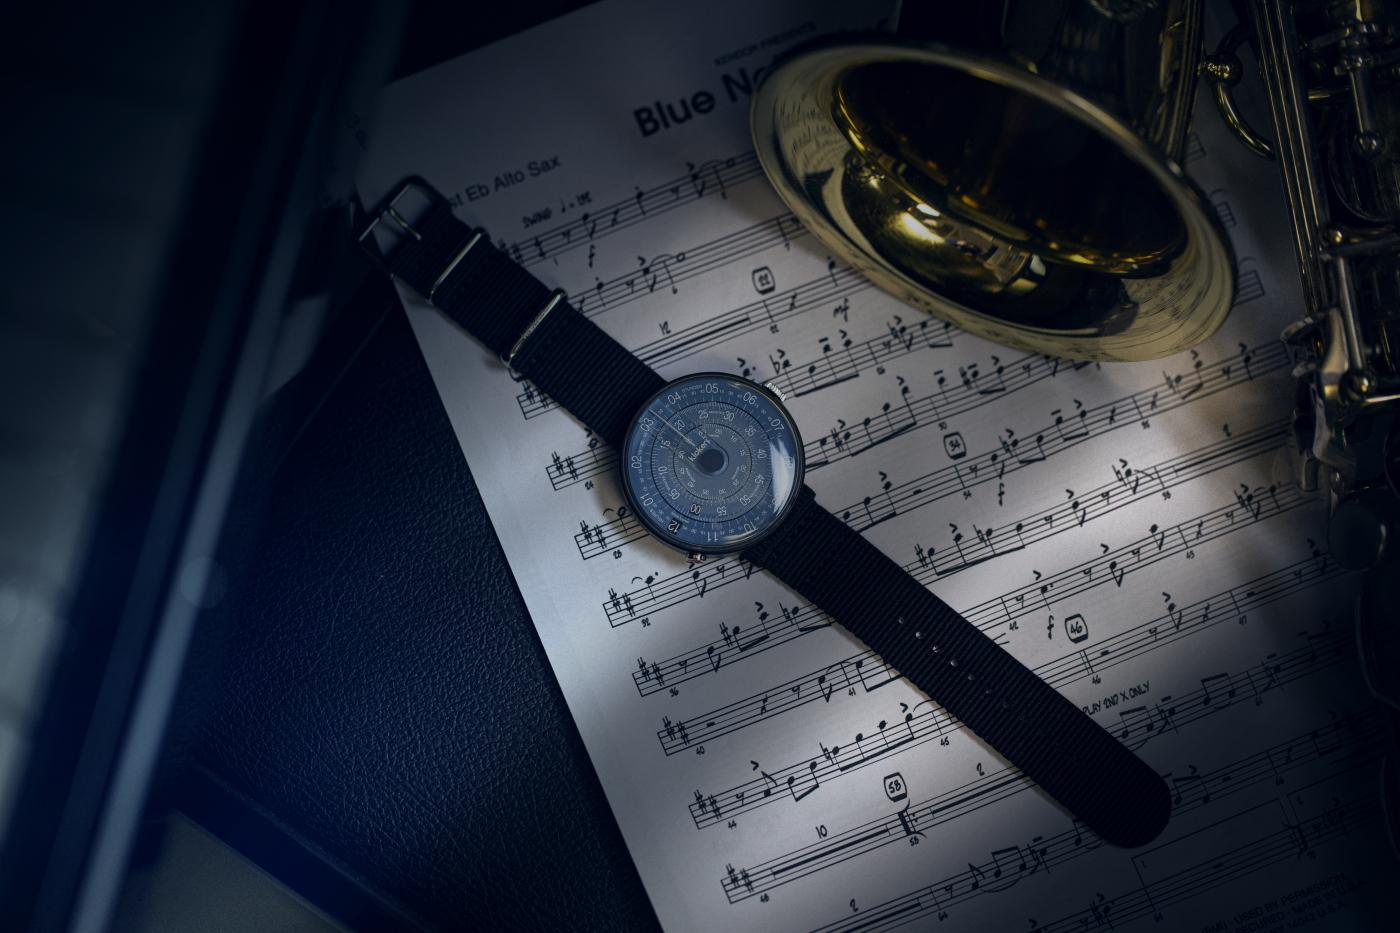 Klokers 01 Blue Note note - Europa Star Magazine 2021